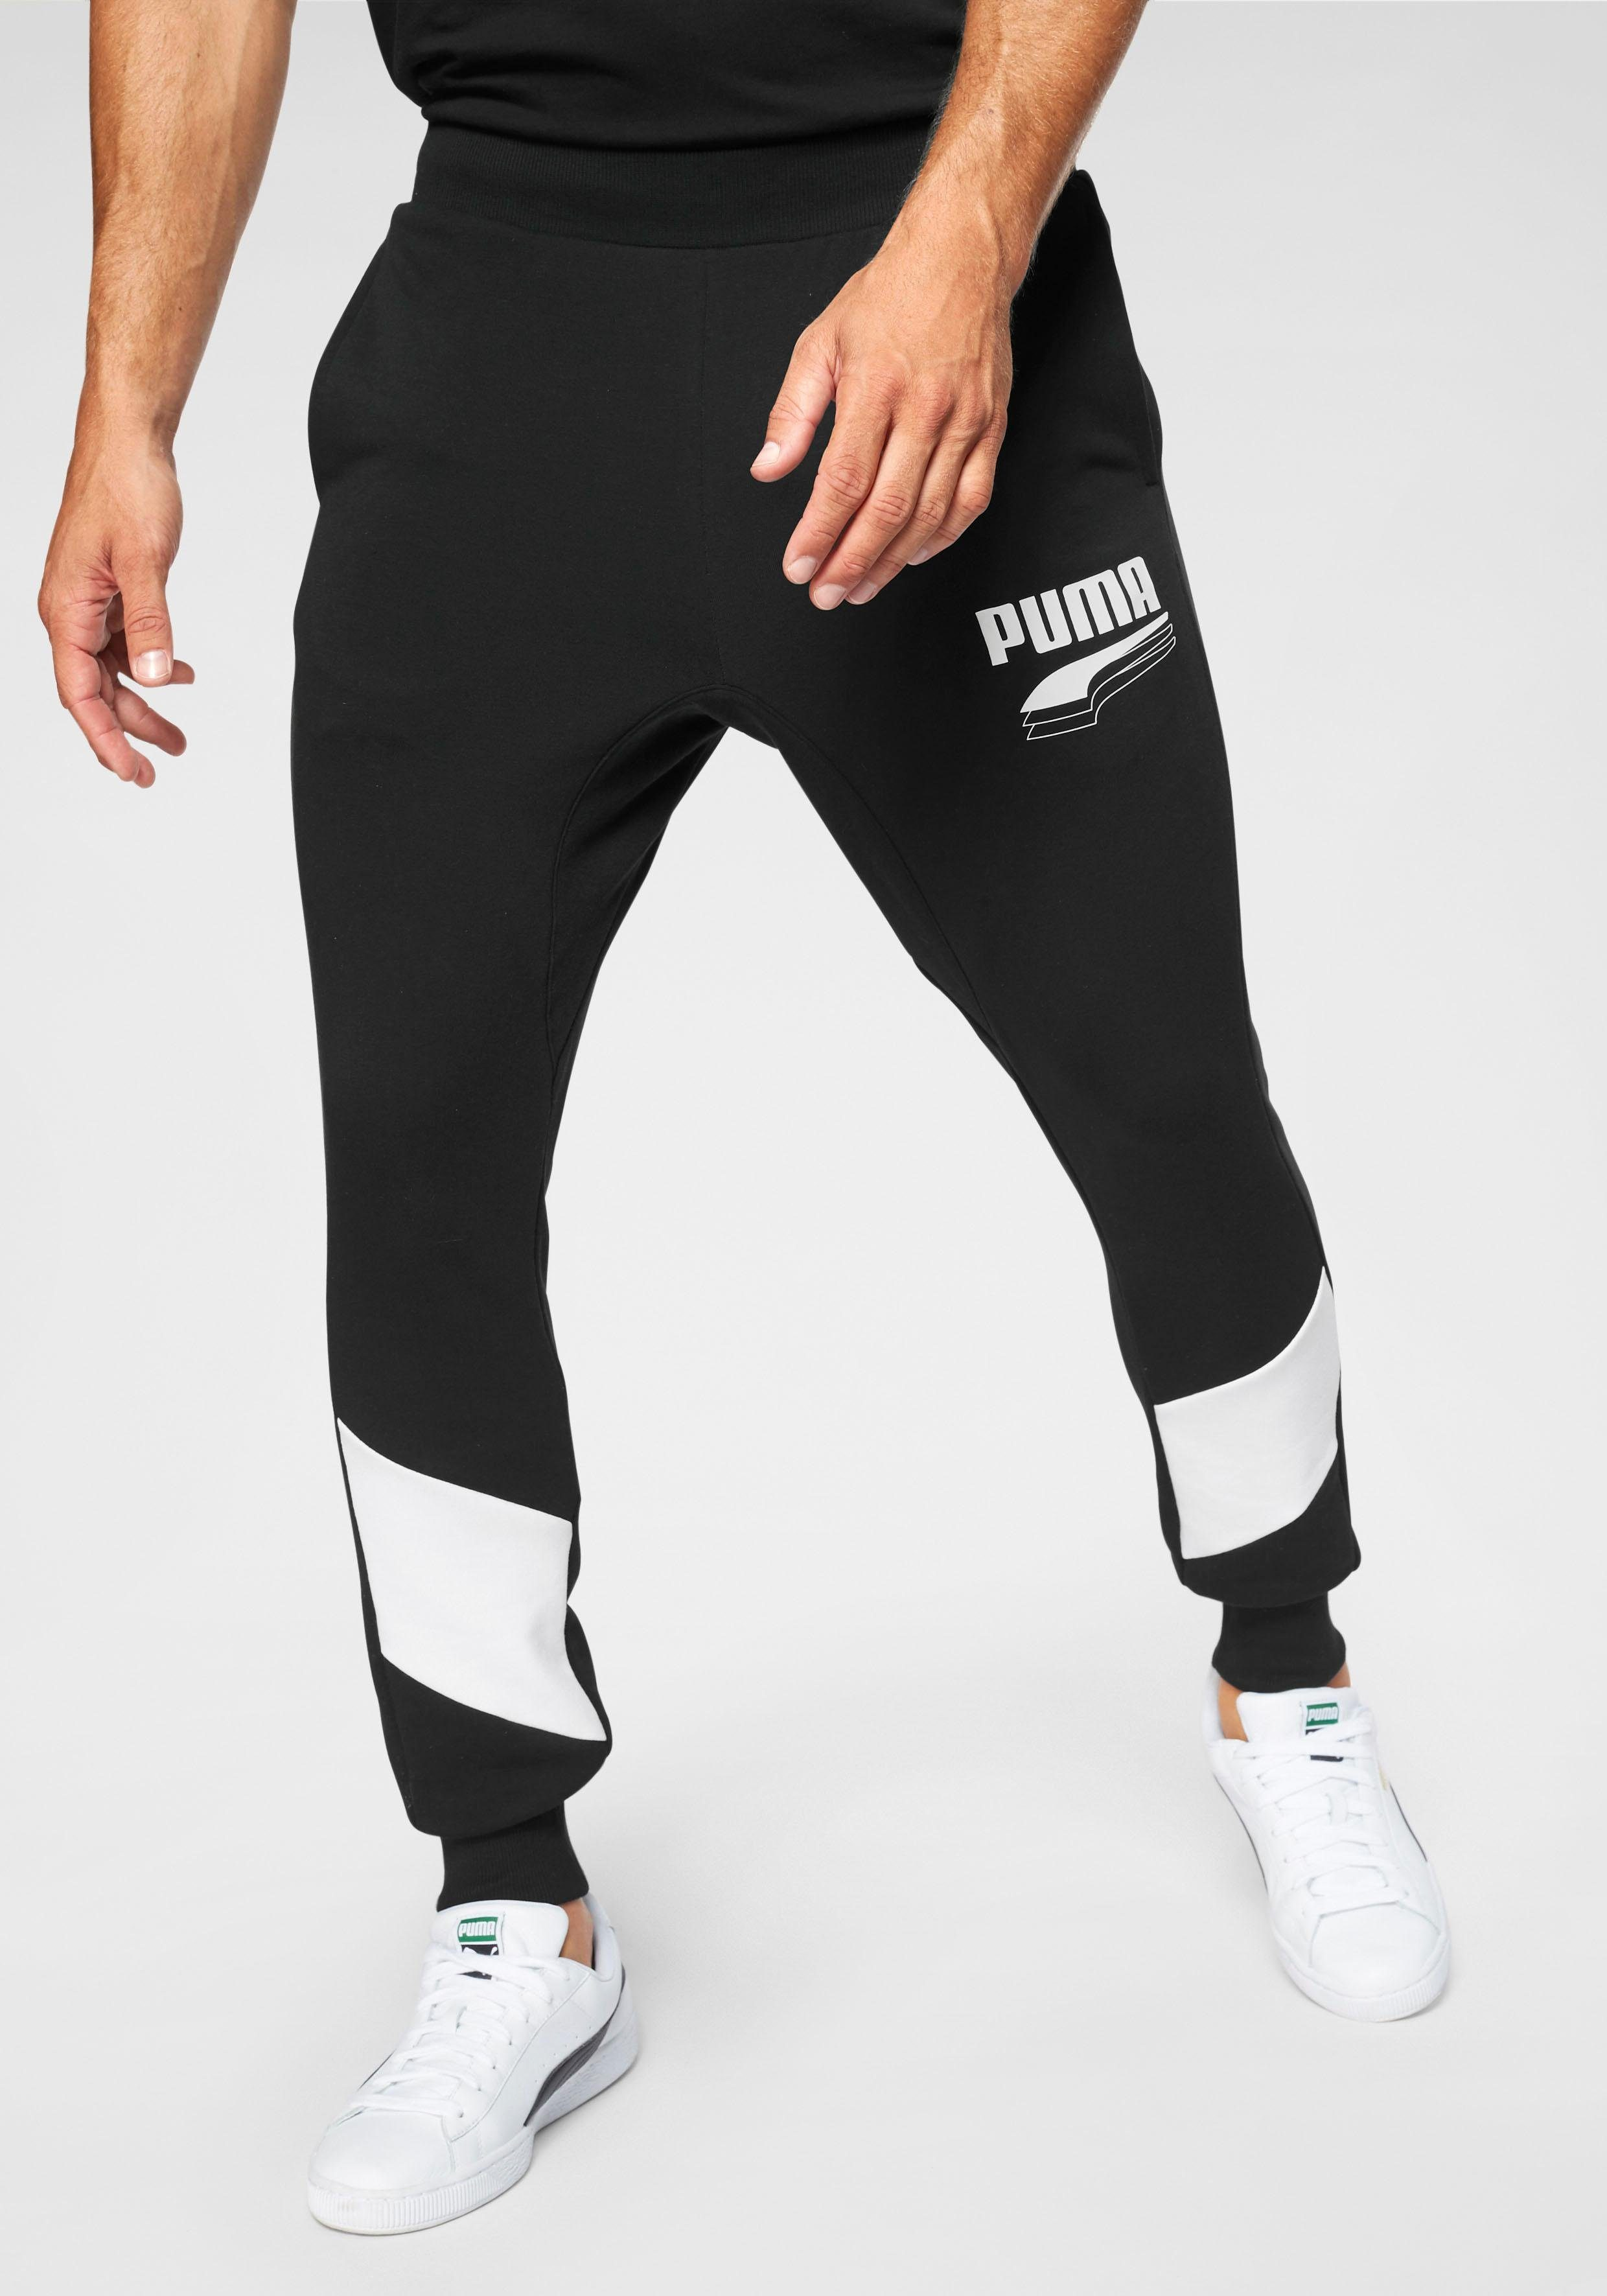 Puma Joggingbroeken online kopen | ZALANDO